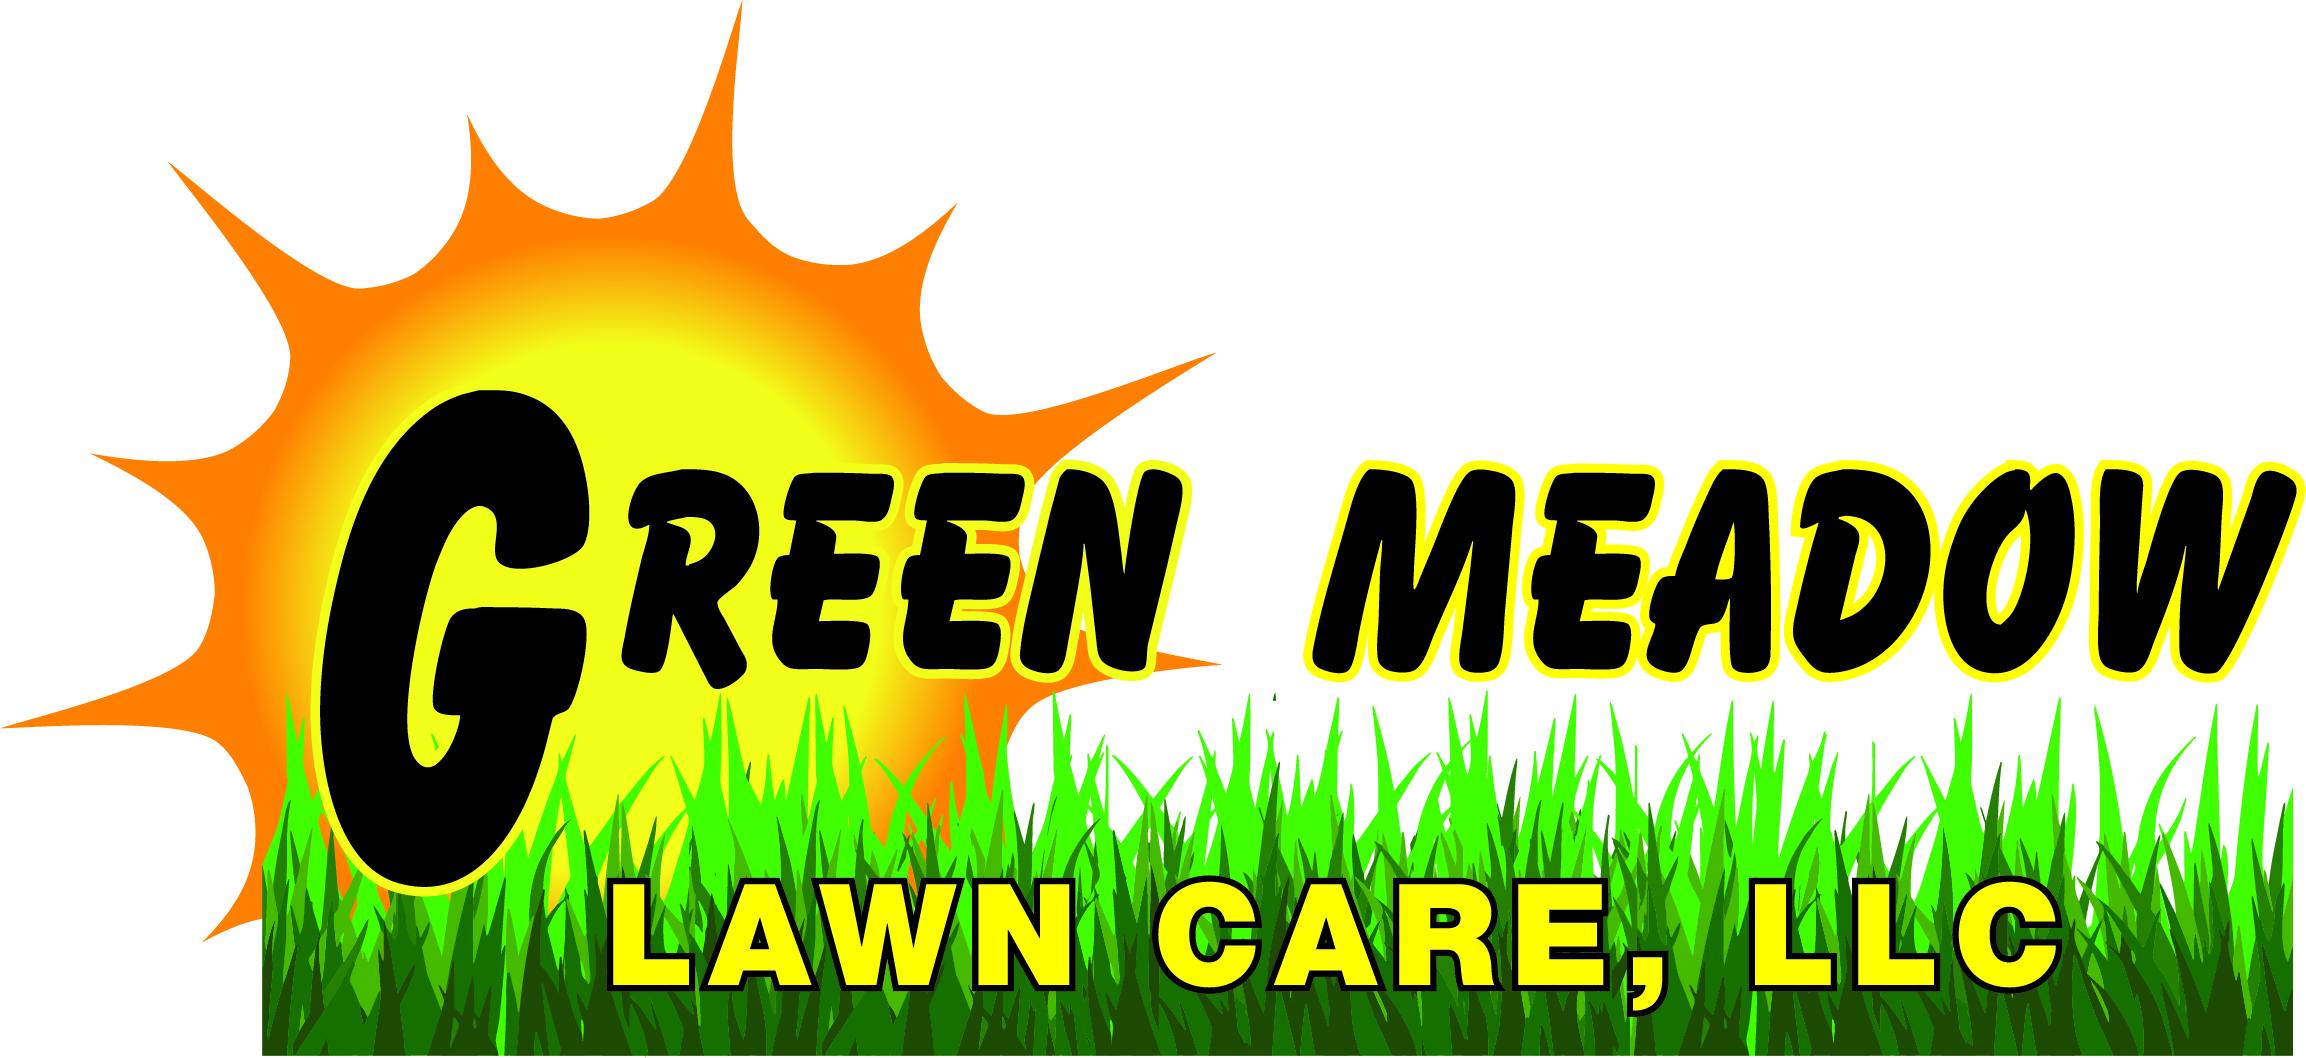 Green Meadow 2016 Logo LG